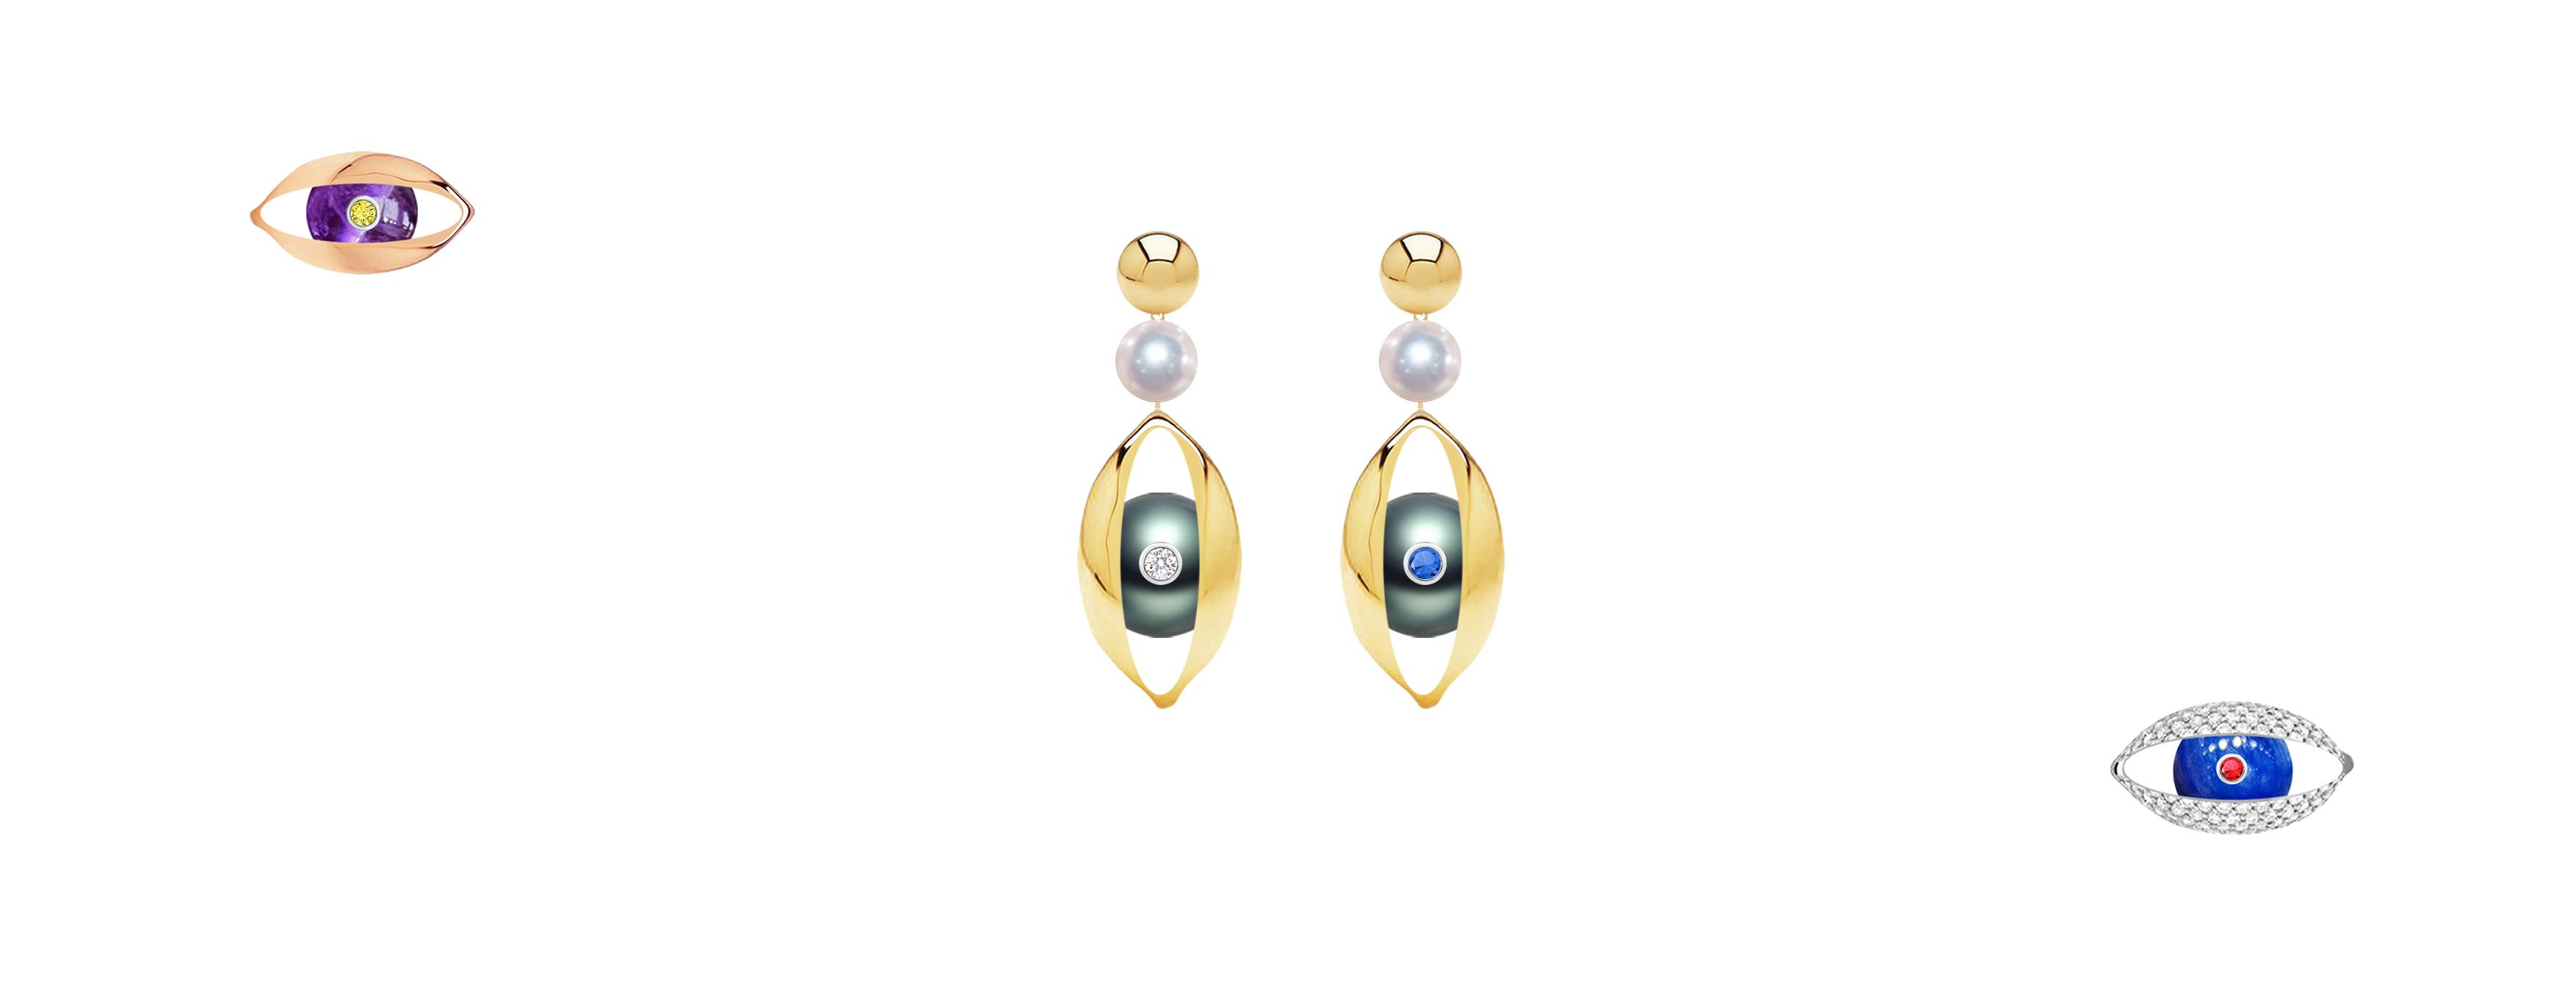 Zeemou Zeng 18ct yellow gold, Tahitain pearl, diamond and sapphire The Eye earrings